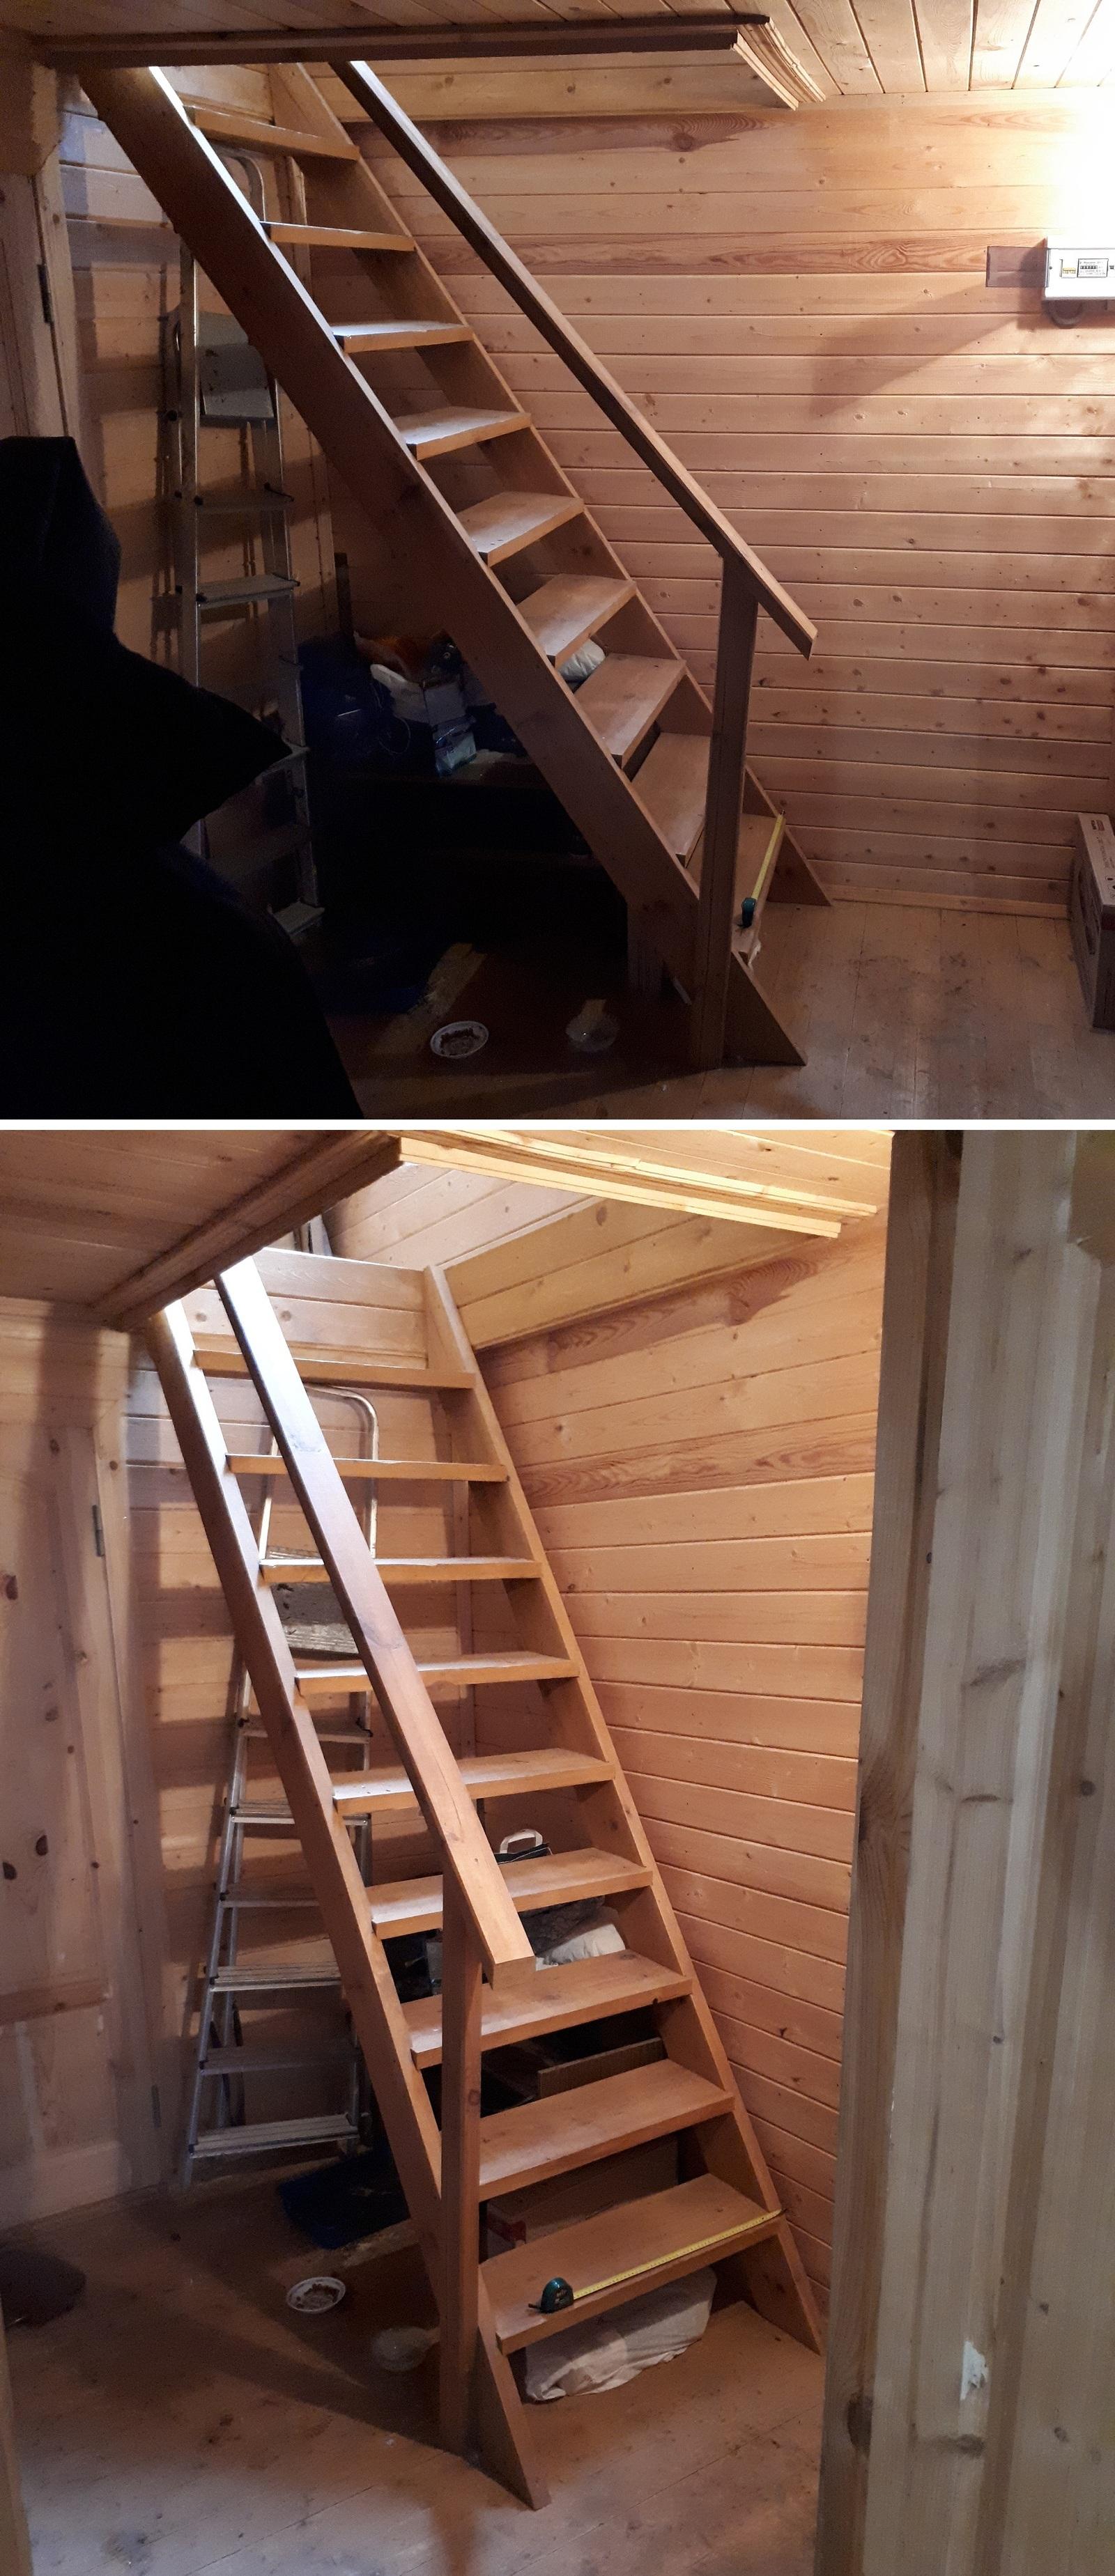 Моя дача фото лестница своими руками